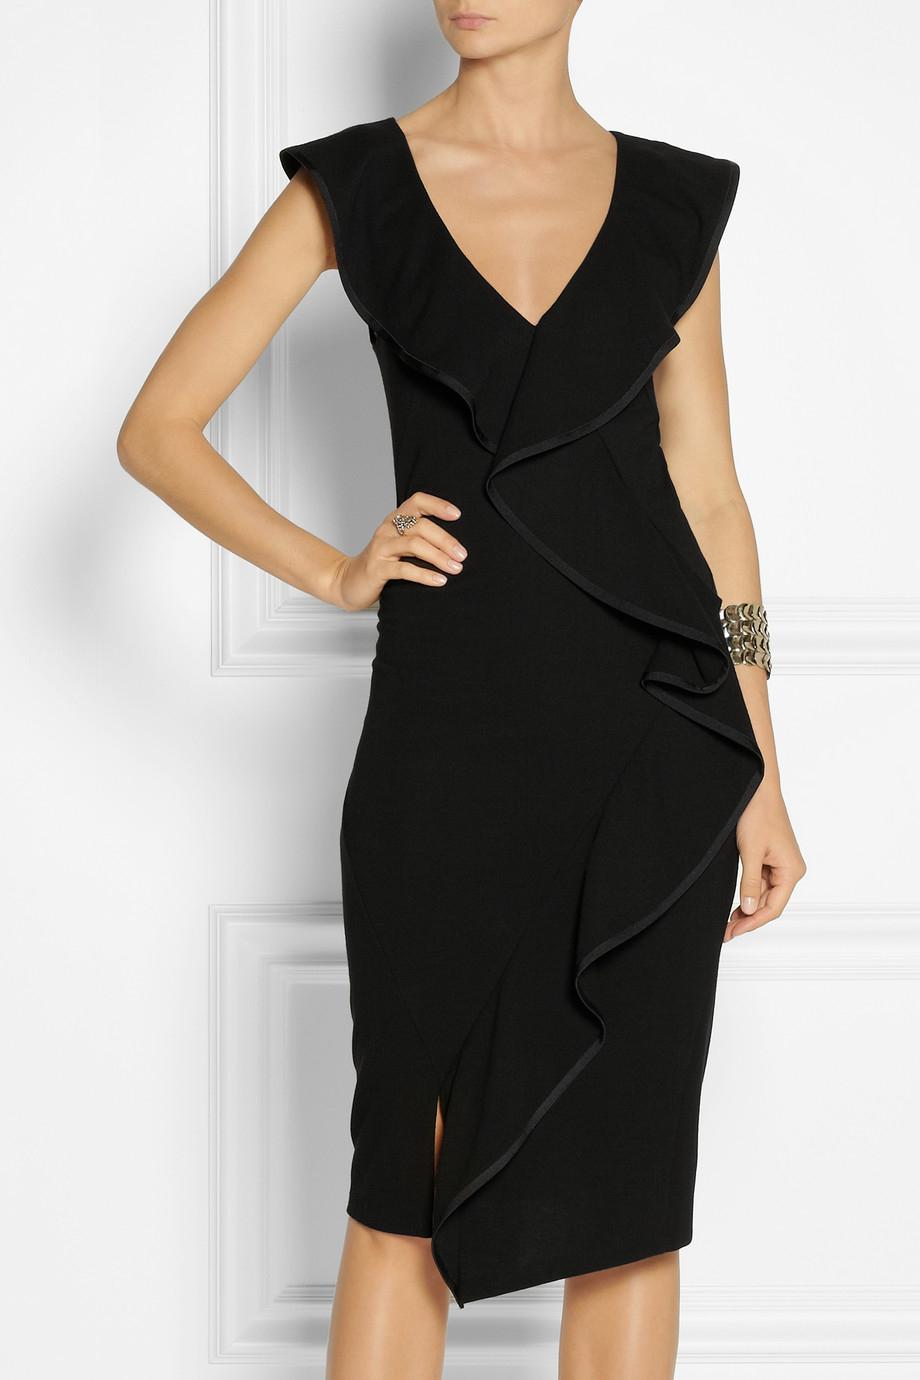 Black modern dress - Gallery